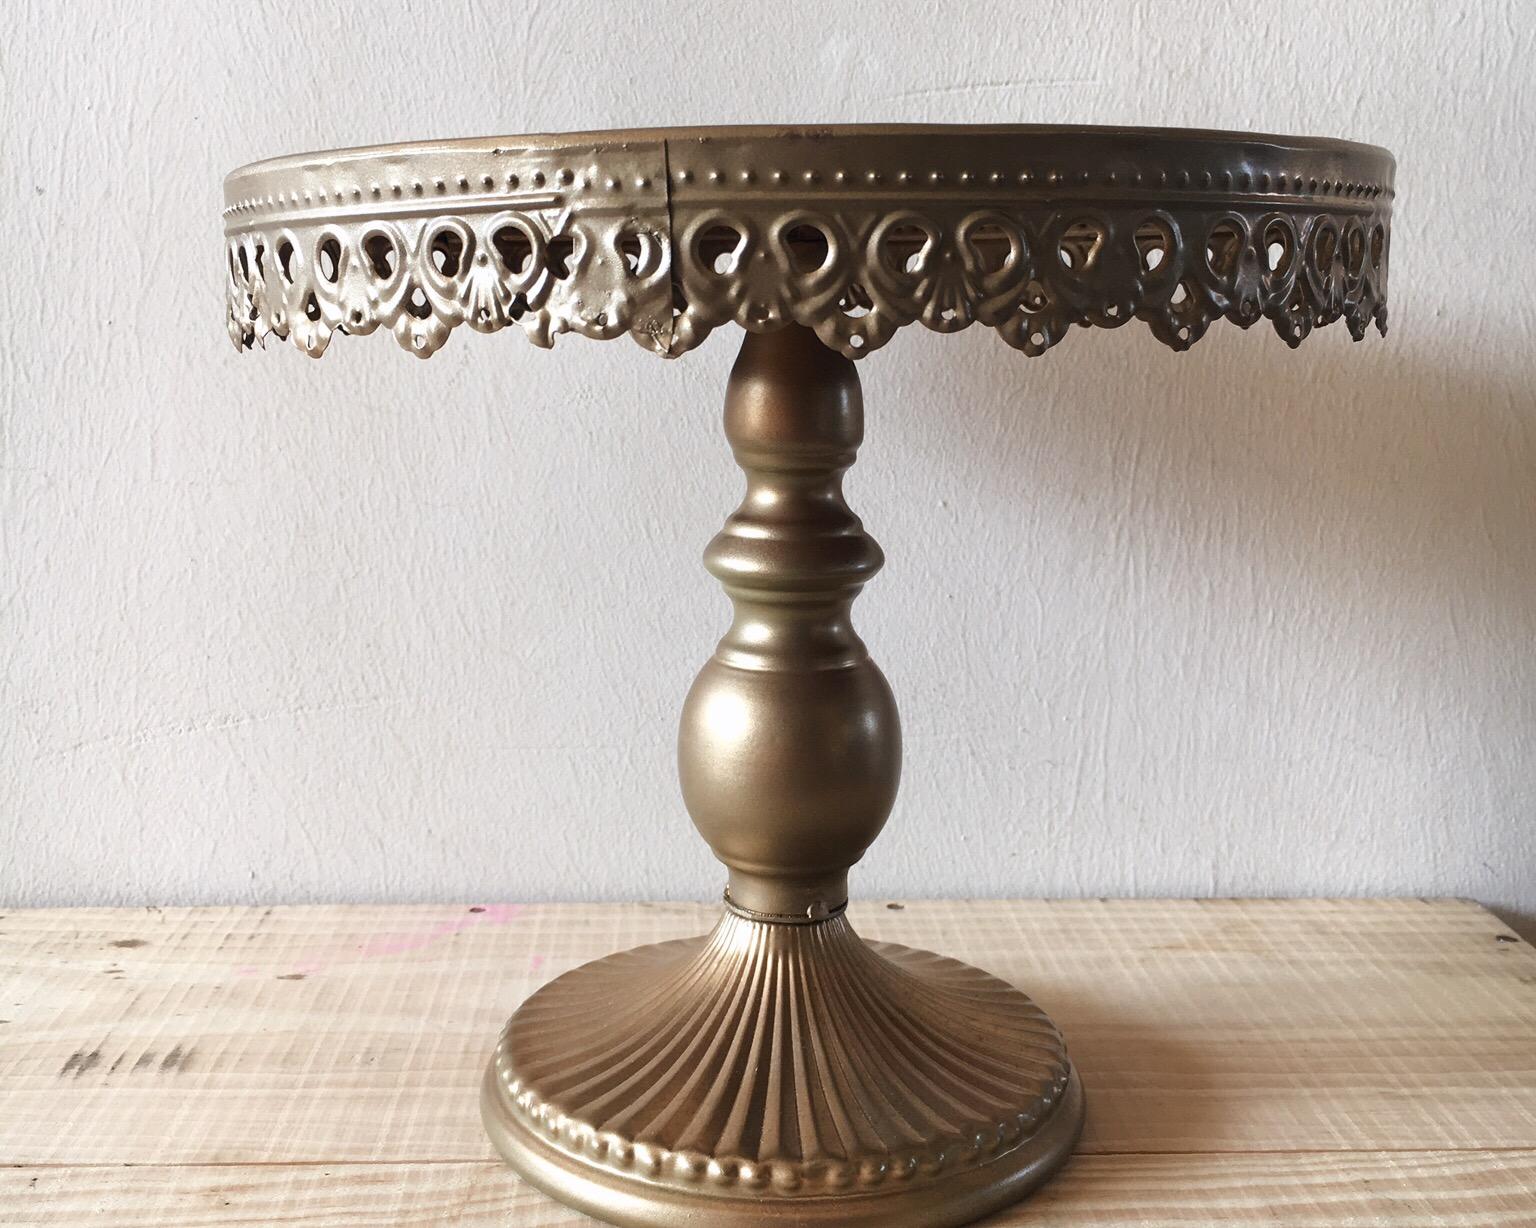 DT01 Bronze Metal Cake Stand